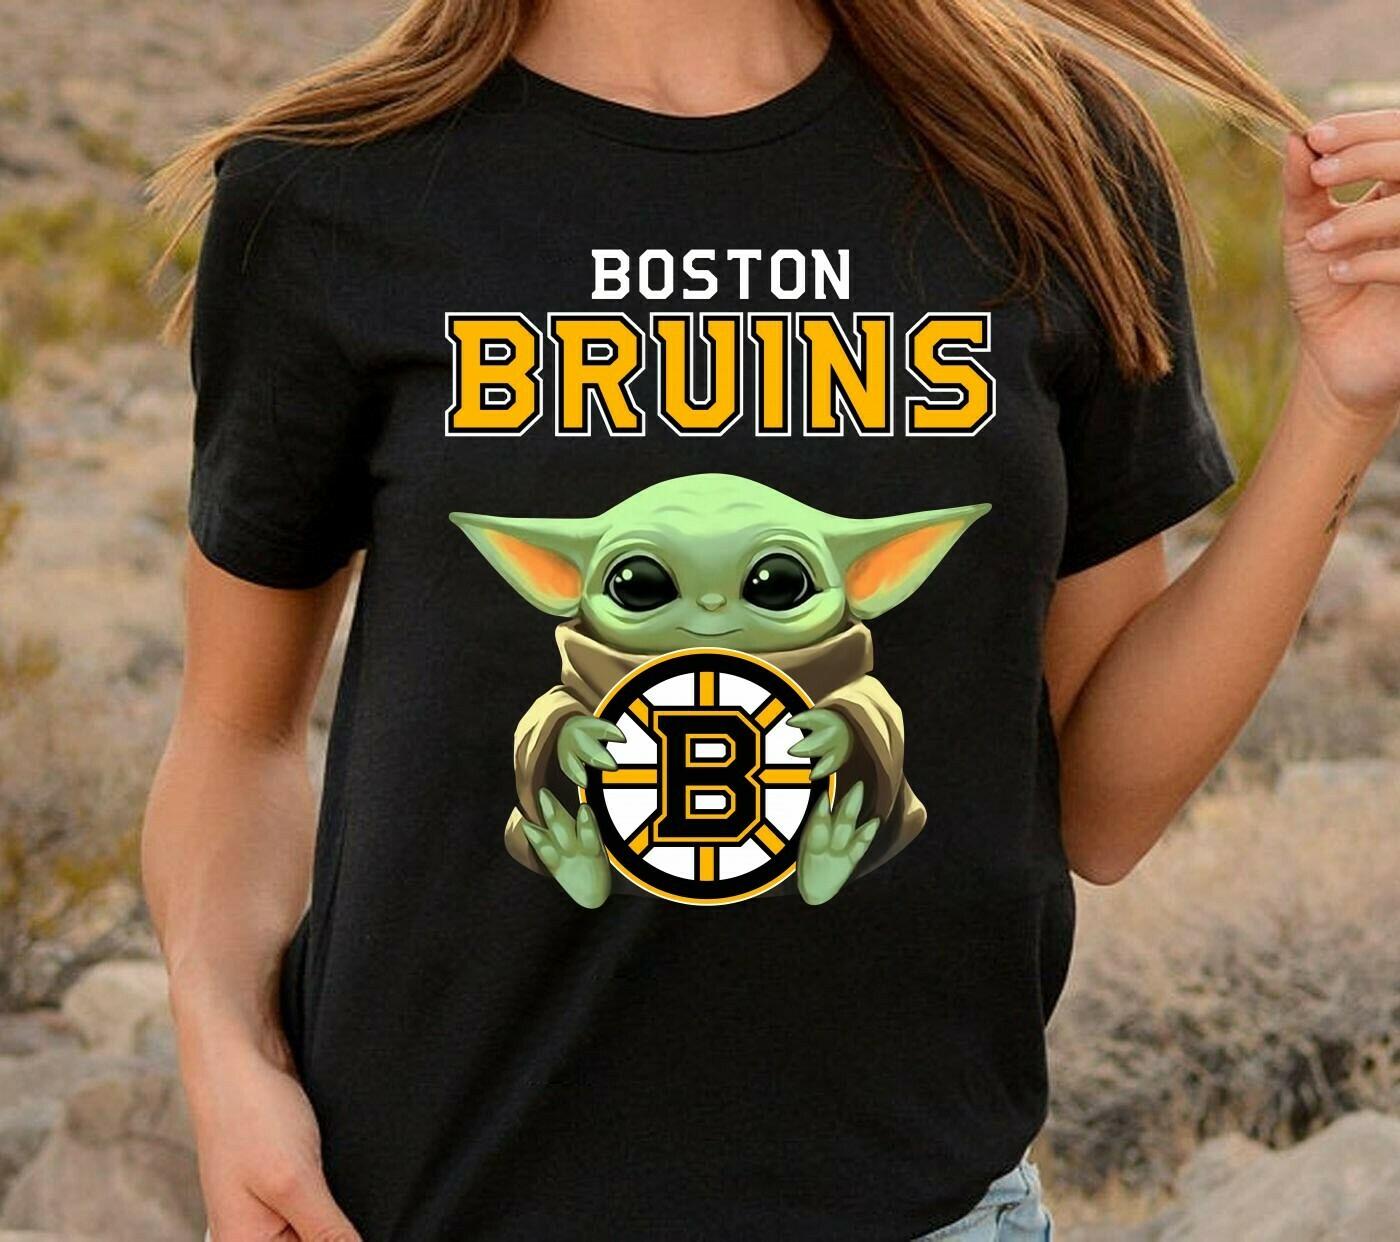 Star Wars Baby Yoda Boston Bruins team sports,The Mandalorian The Child First Memories Floating Ice hockey T-Shirt Long Sleeve Sweatshirt Hoodie Jolly Family Gifts